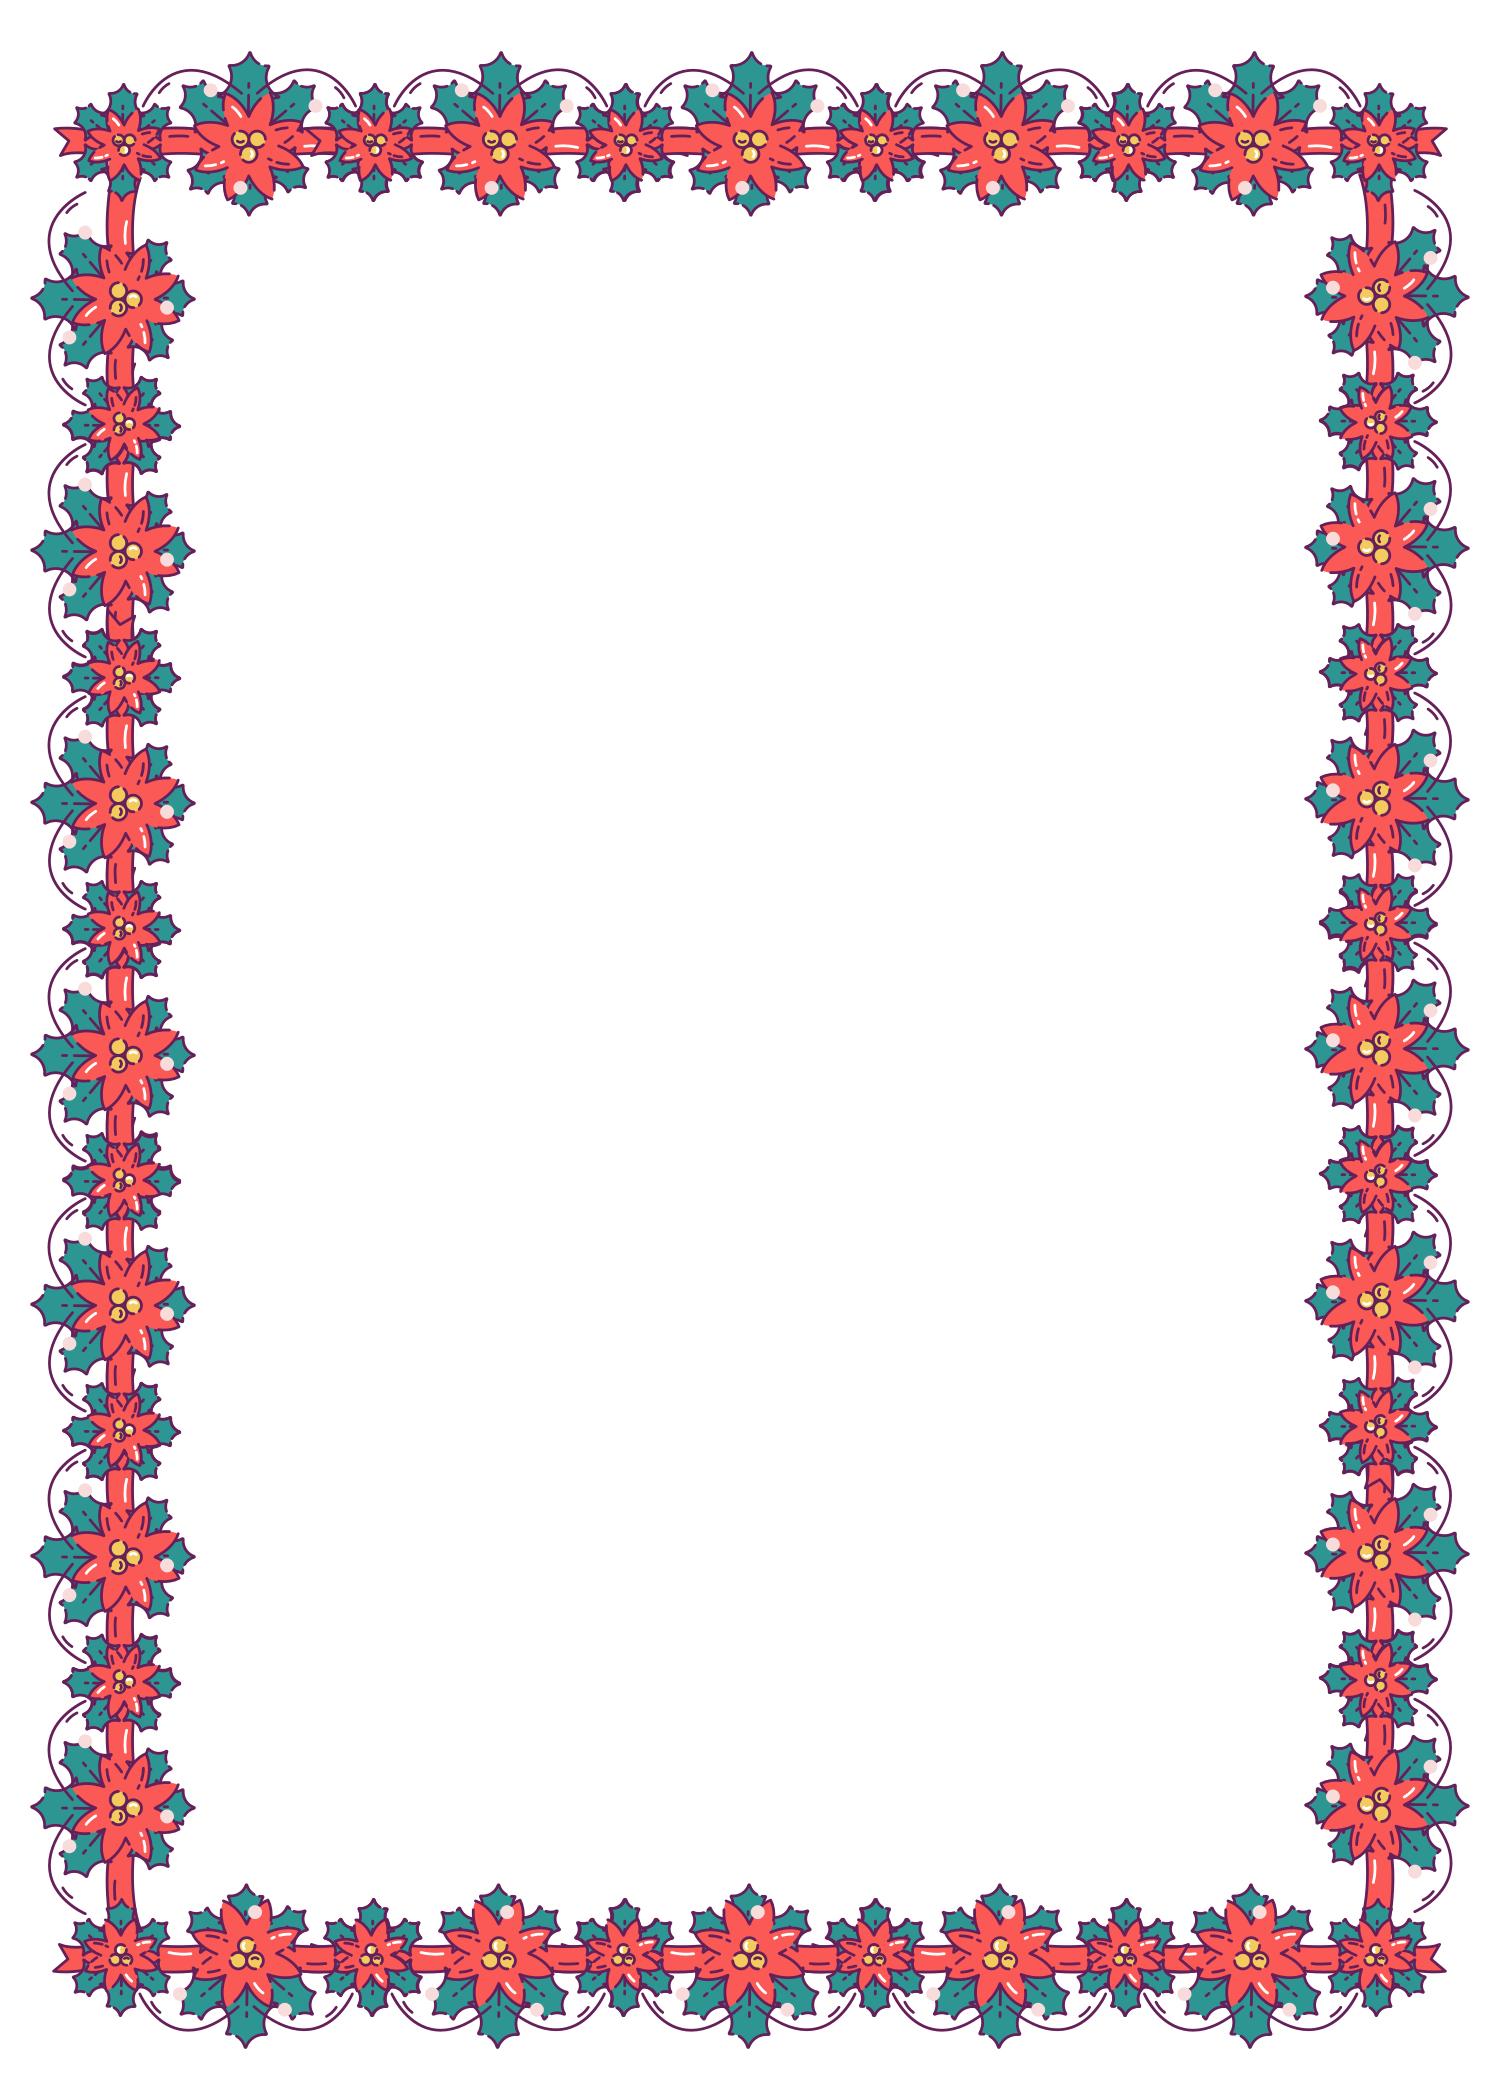 Christmas Poinsettia Border (Free) - Christmas HQ